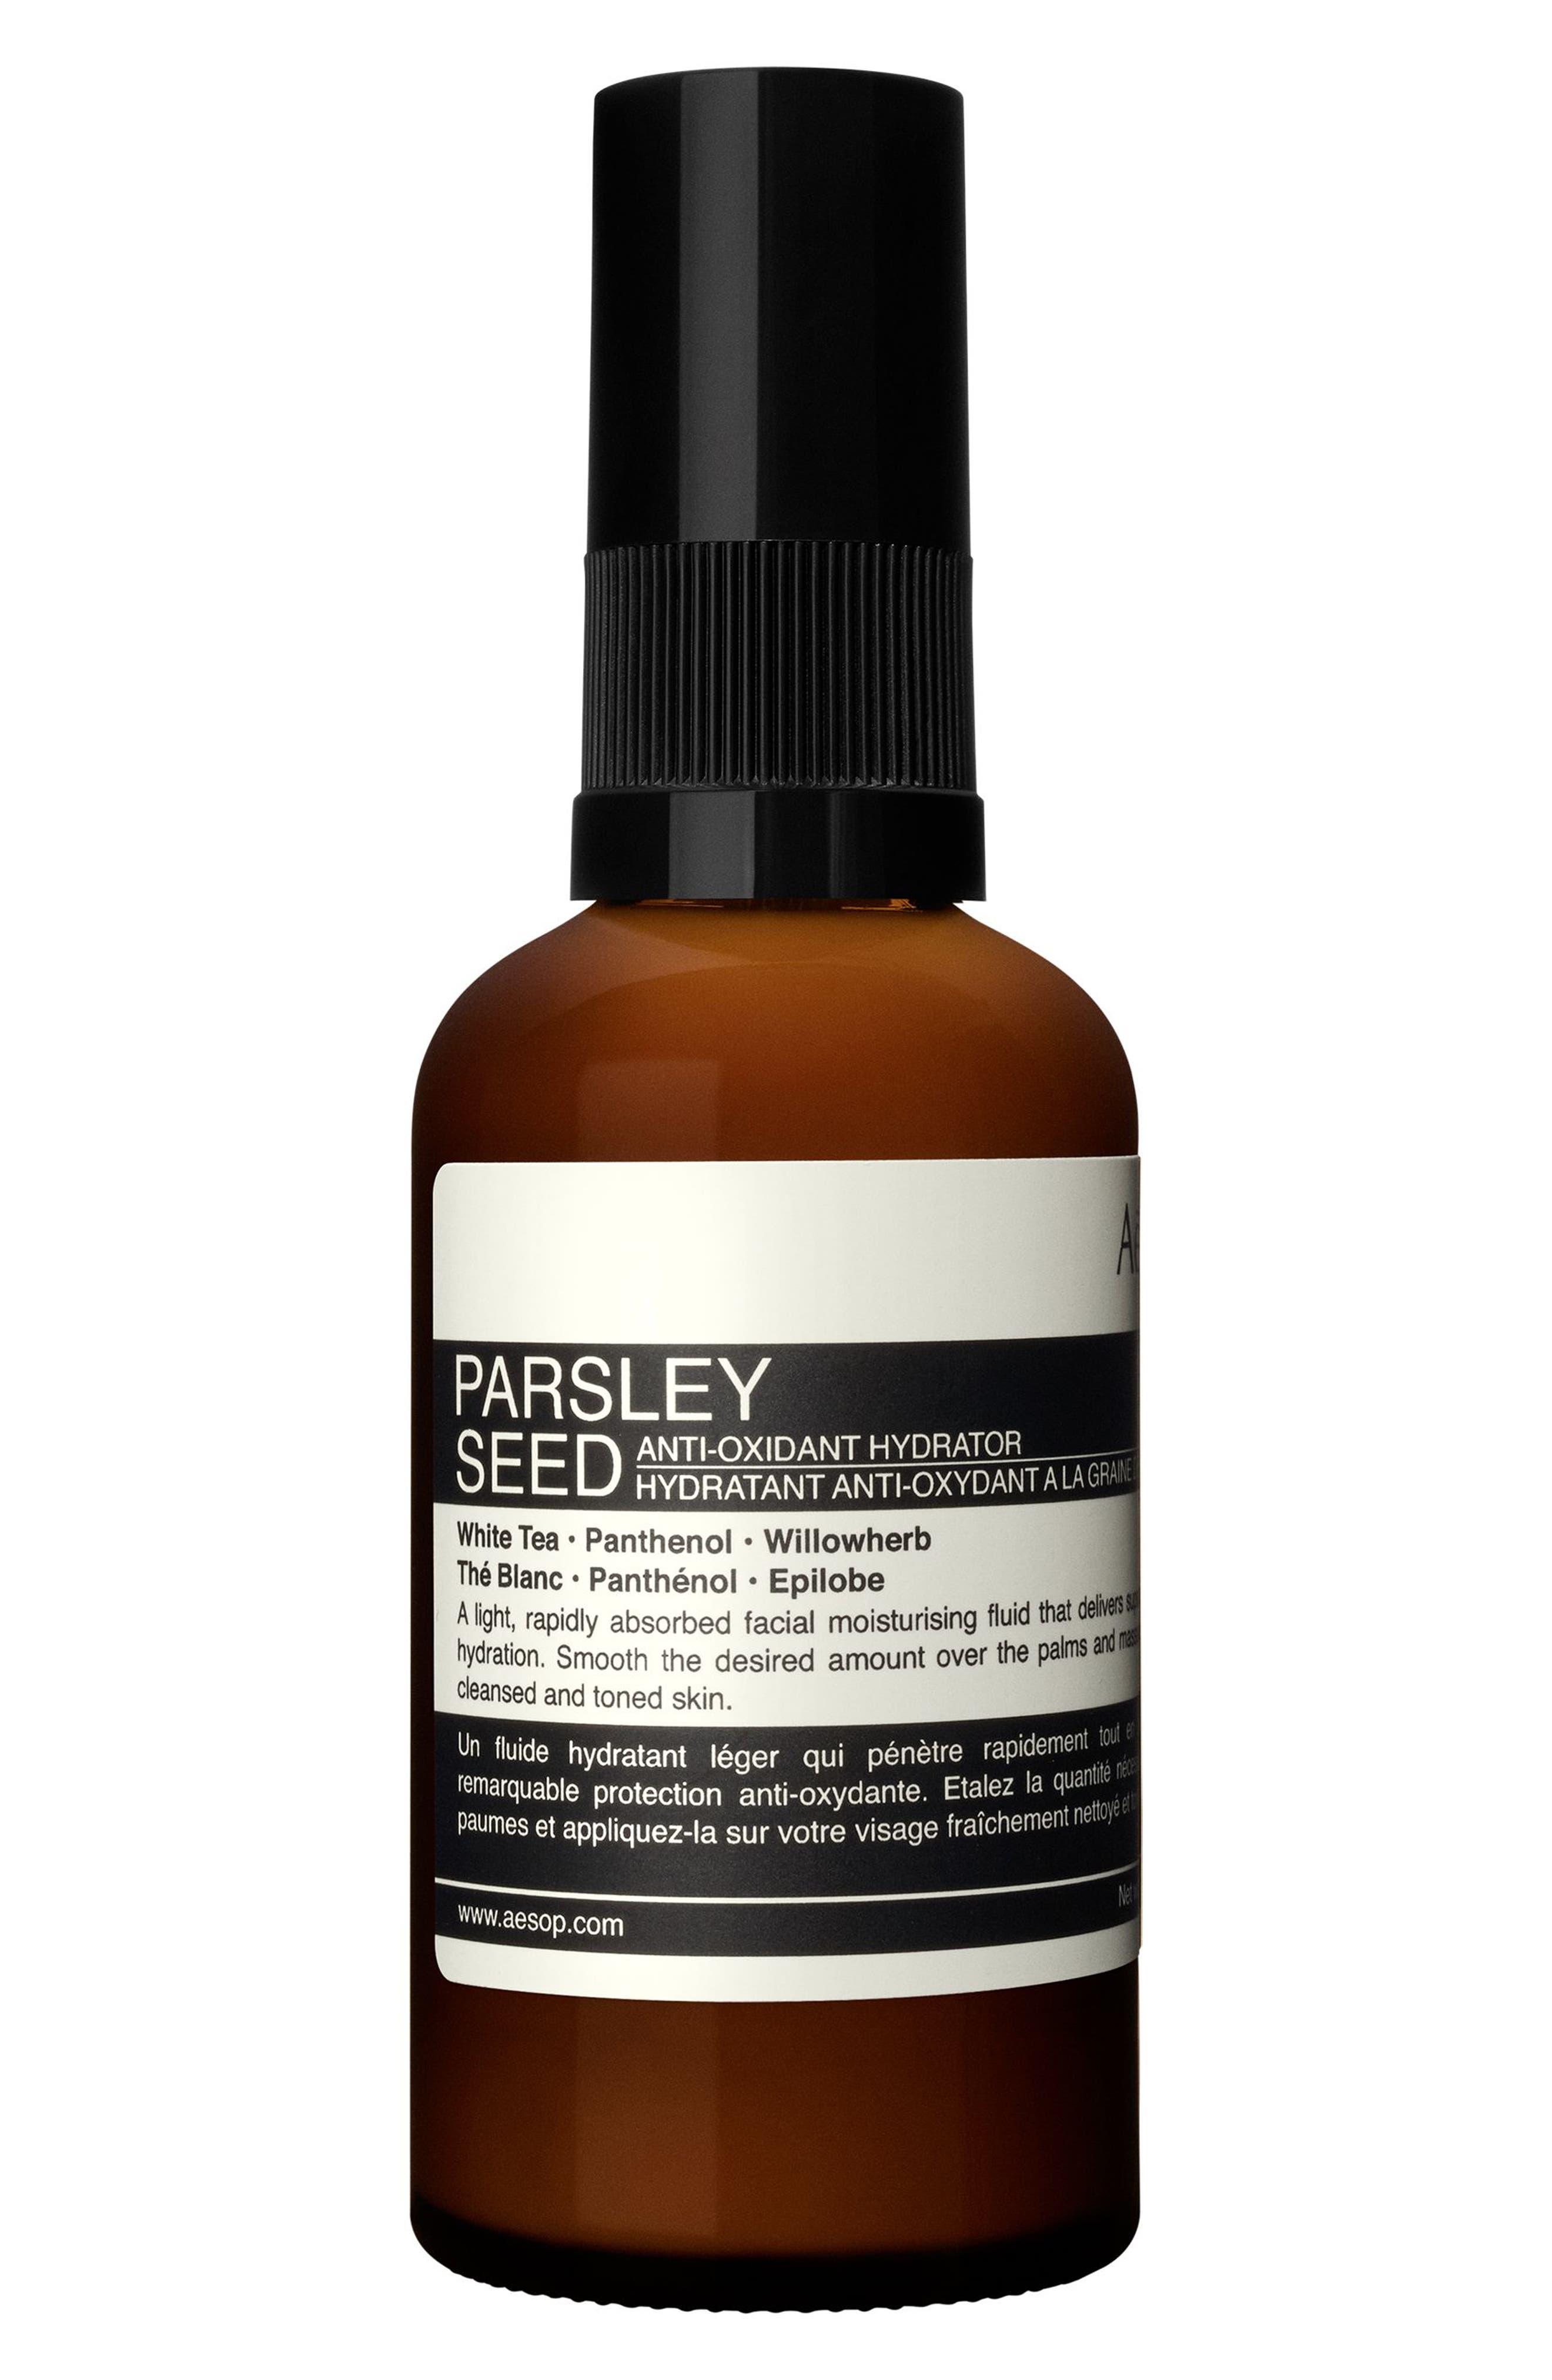 Parsley Seed Anti-Oxidant Hydrator Fluid Moisturizer